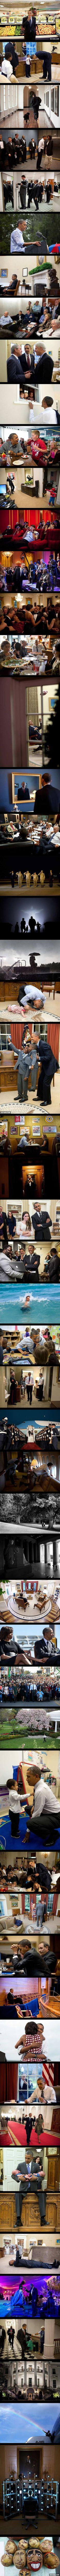 Official White House Photographer Pete Souza Reveals His Favourite Photos Of Obama